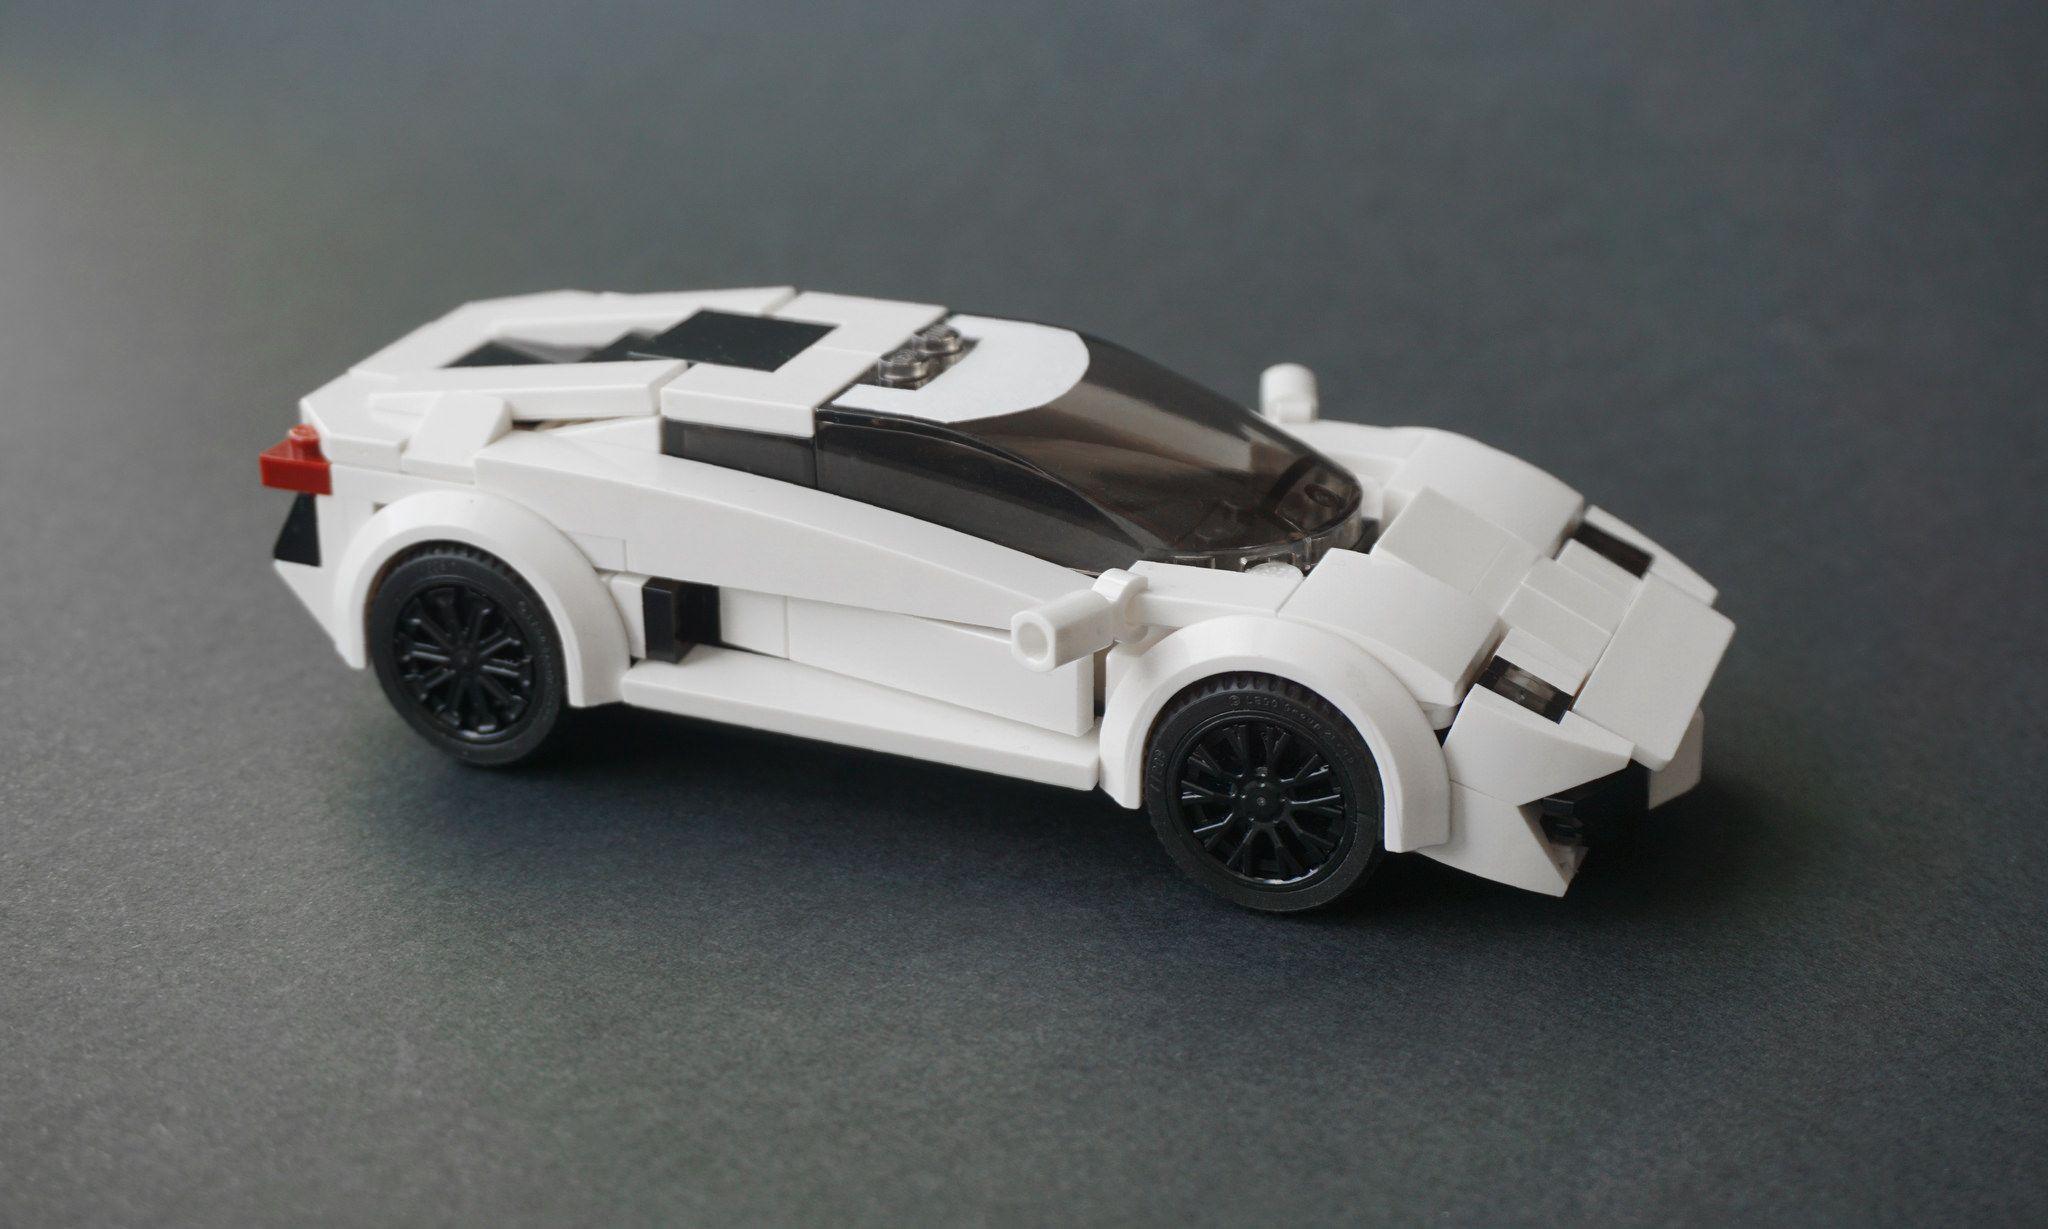 Lamborghini Aventador Lego Cars Lego Truck Lego Cars Instructions